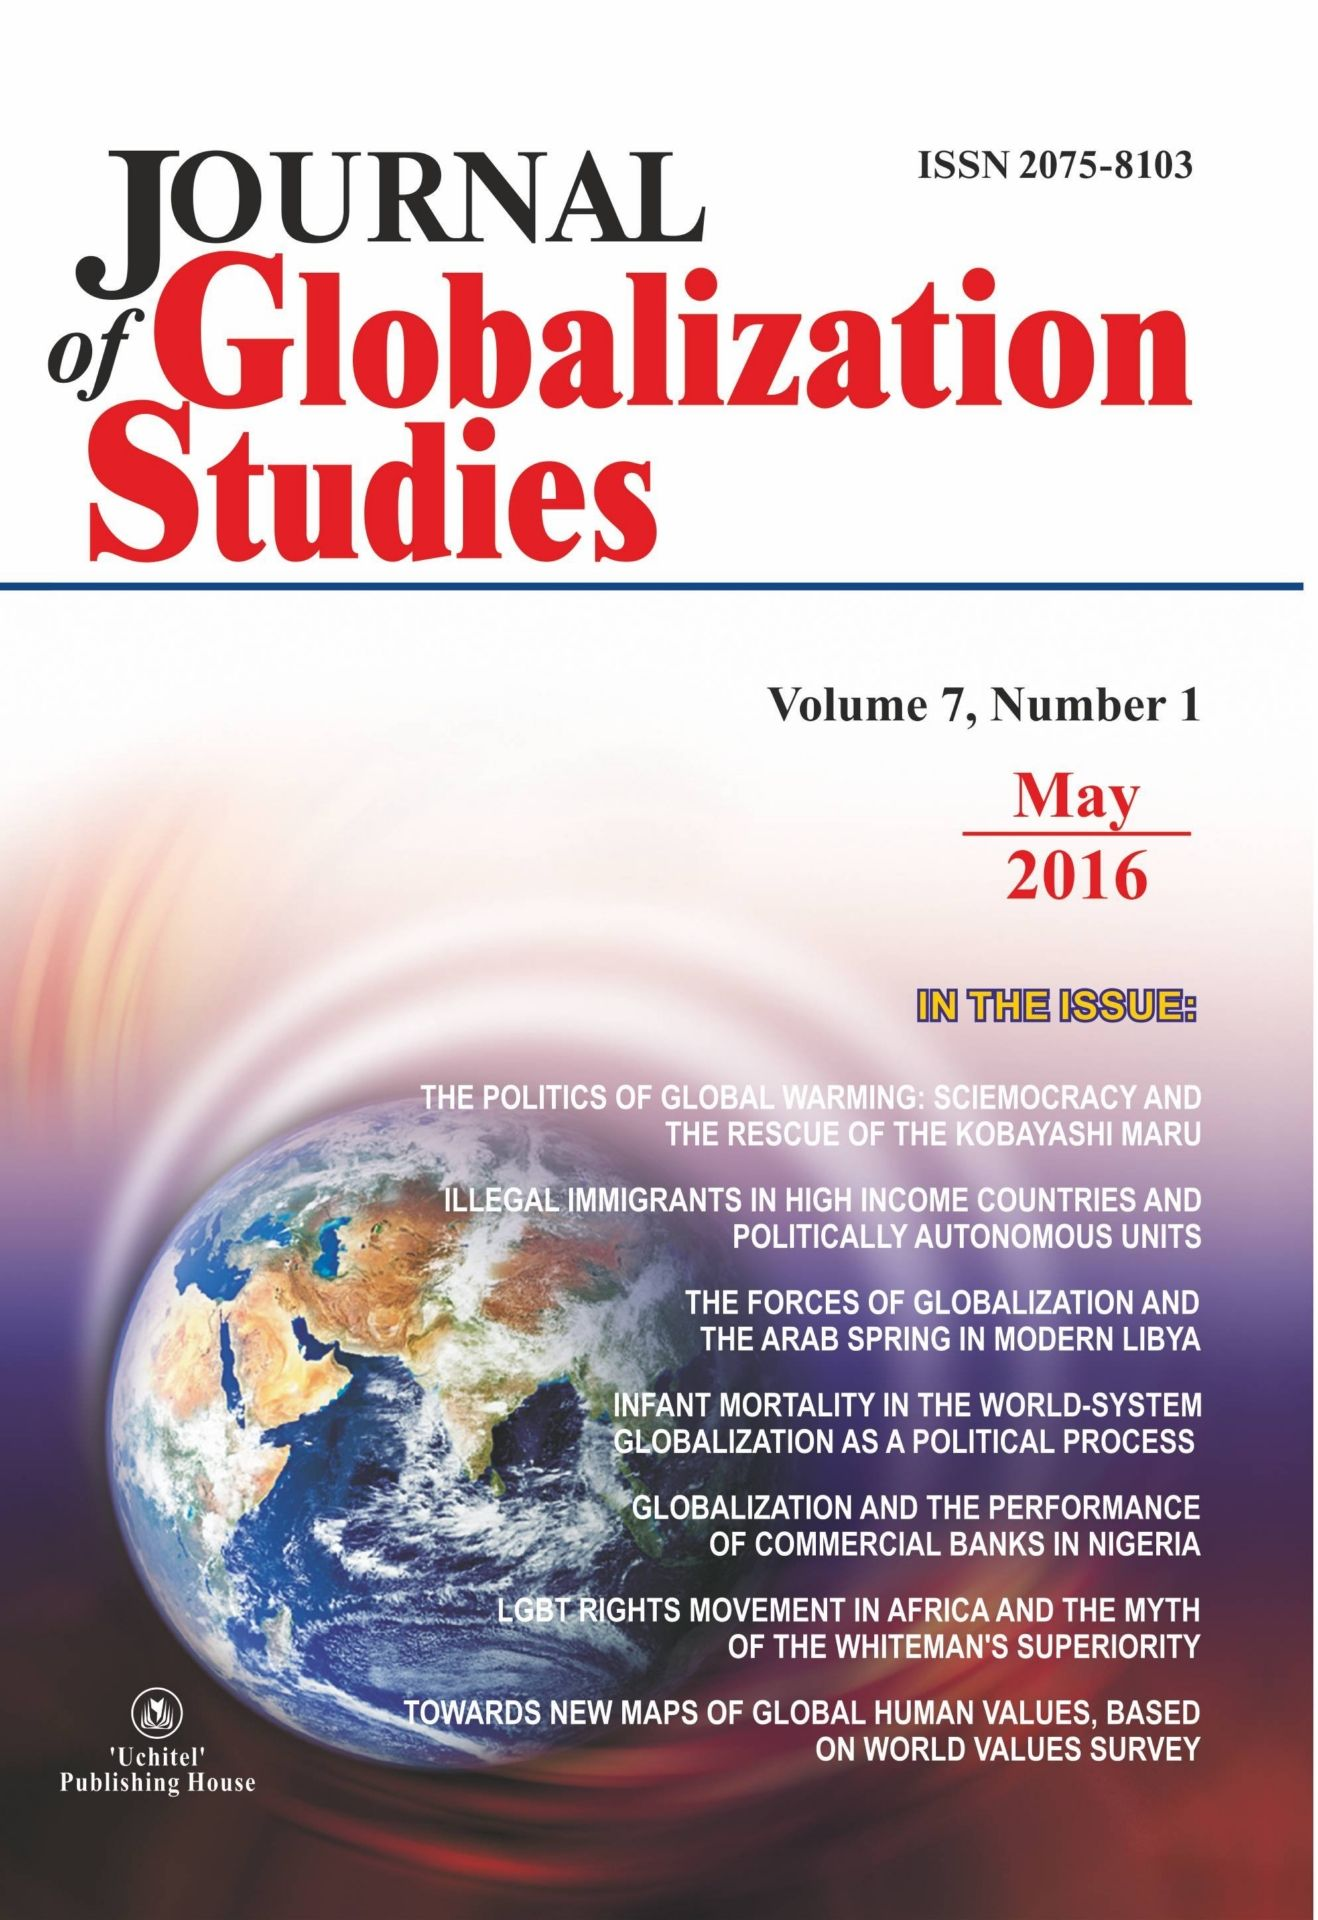 Journal of Globalization Studies Volume 7, Number 1, 2016 г. Журнал глобализационных исследований Международный журнал на английском языке